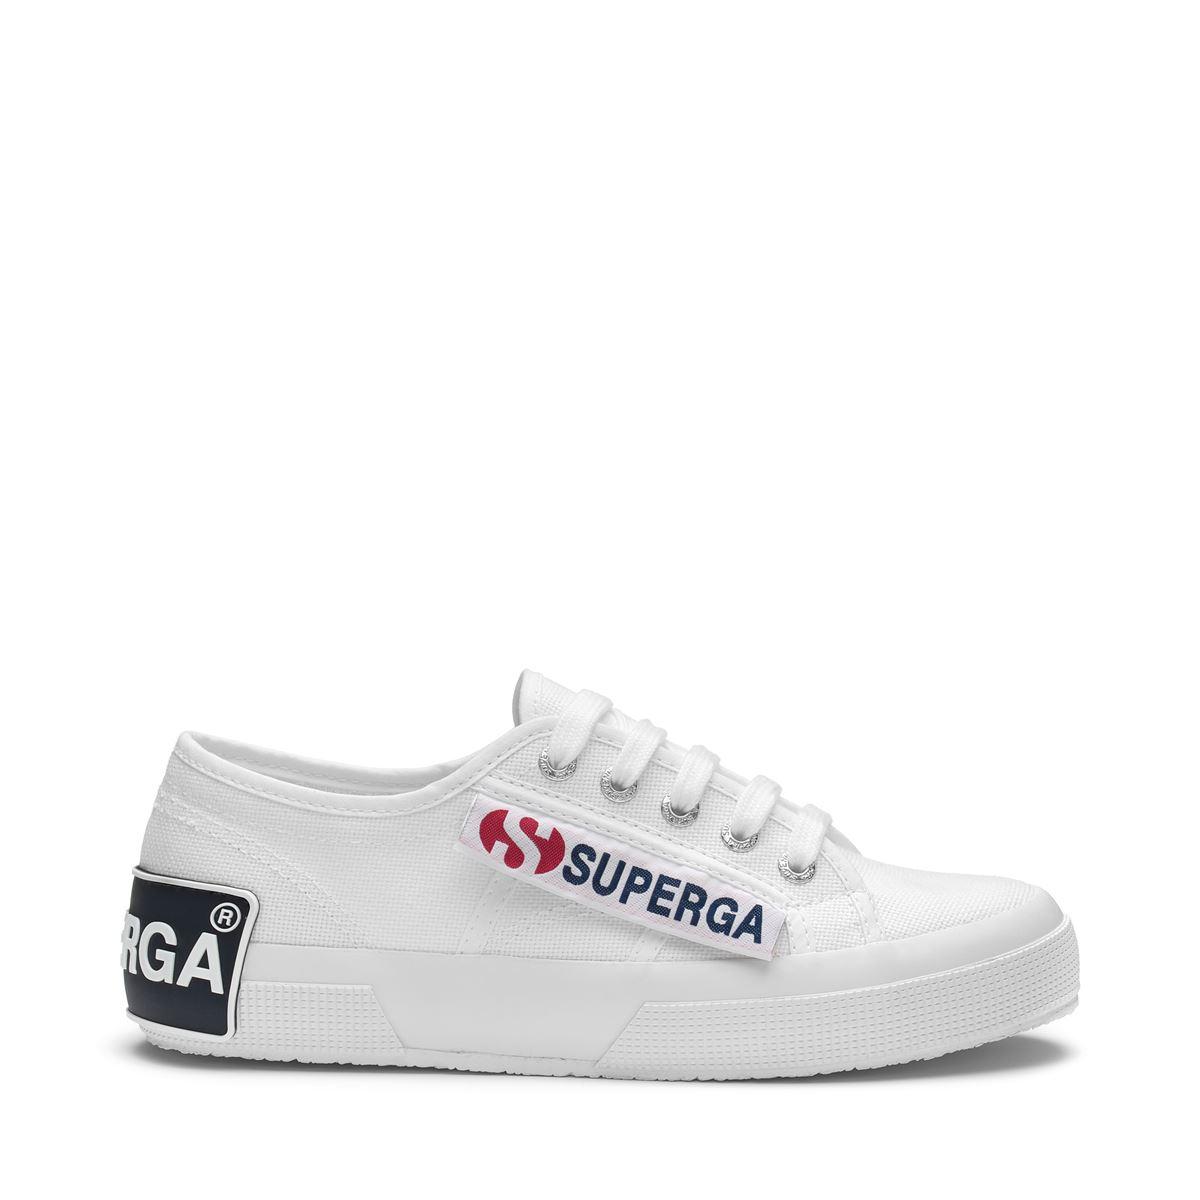 Le Superga Superga donna-S1117PW